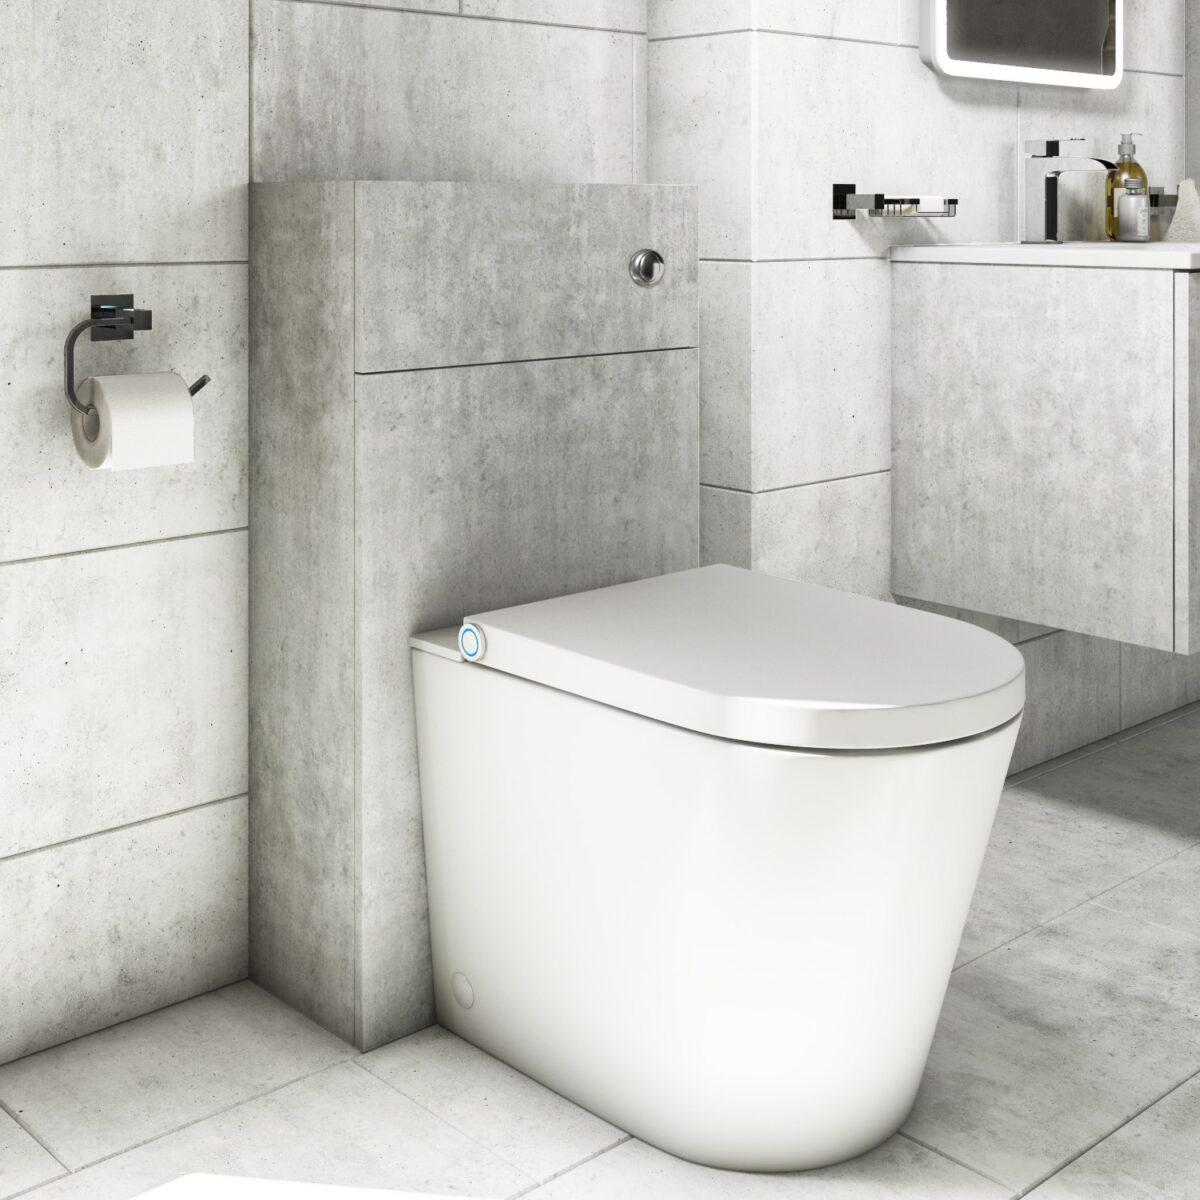 wc-cassetta-esterna-design-4